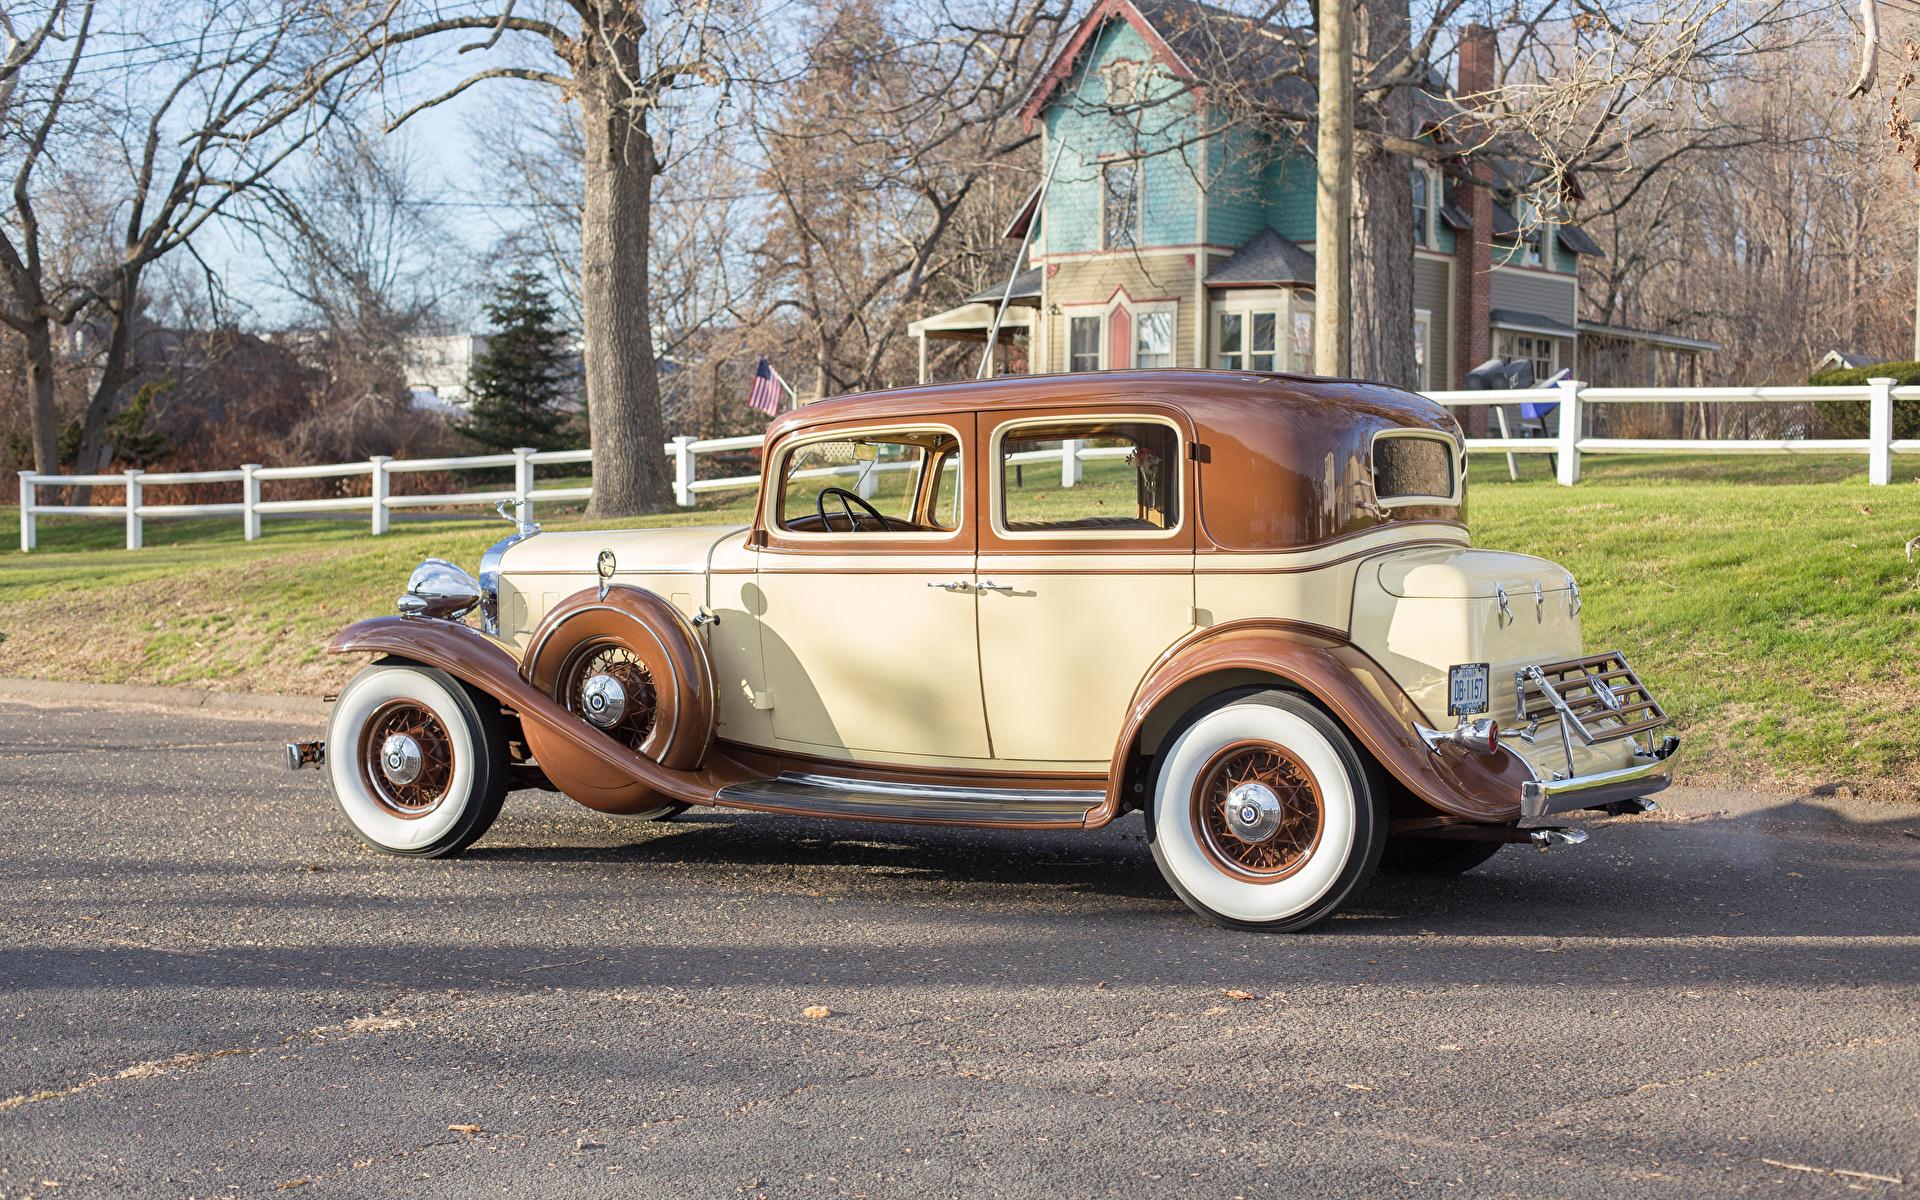 Картинка Cadillac 1932 V12 370-B Town Sedan by Fisher Сбоку Автомобили 1920x1200 Кадиллак авто машины машина автомобиль